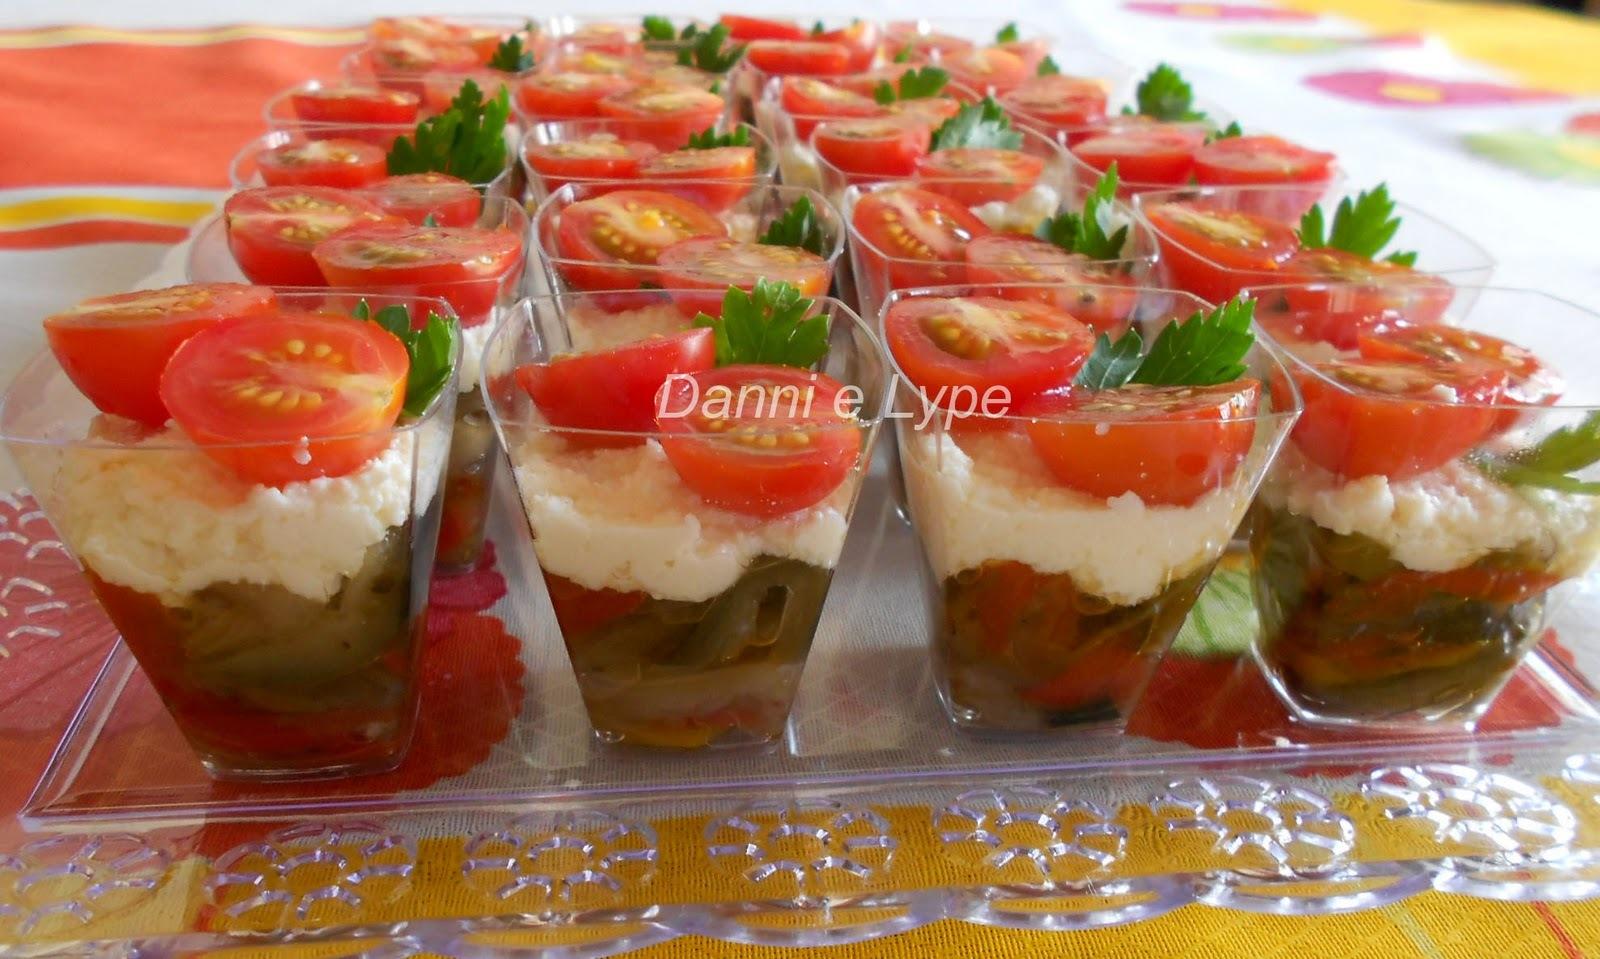 verrine de berinjela ricota e tomatinho cereja